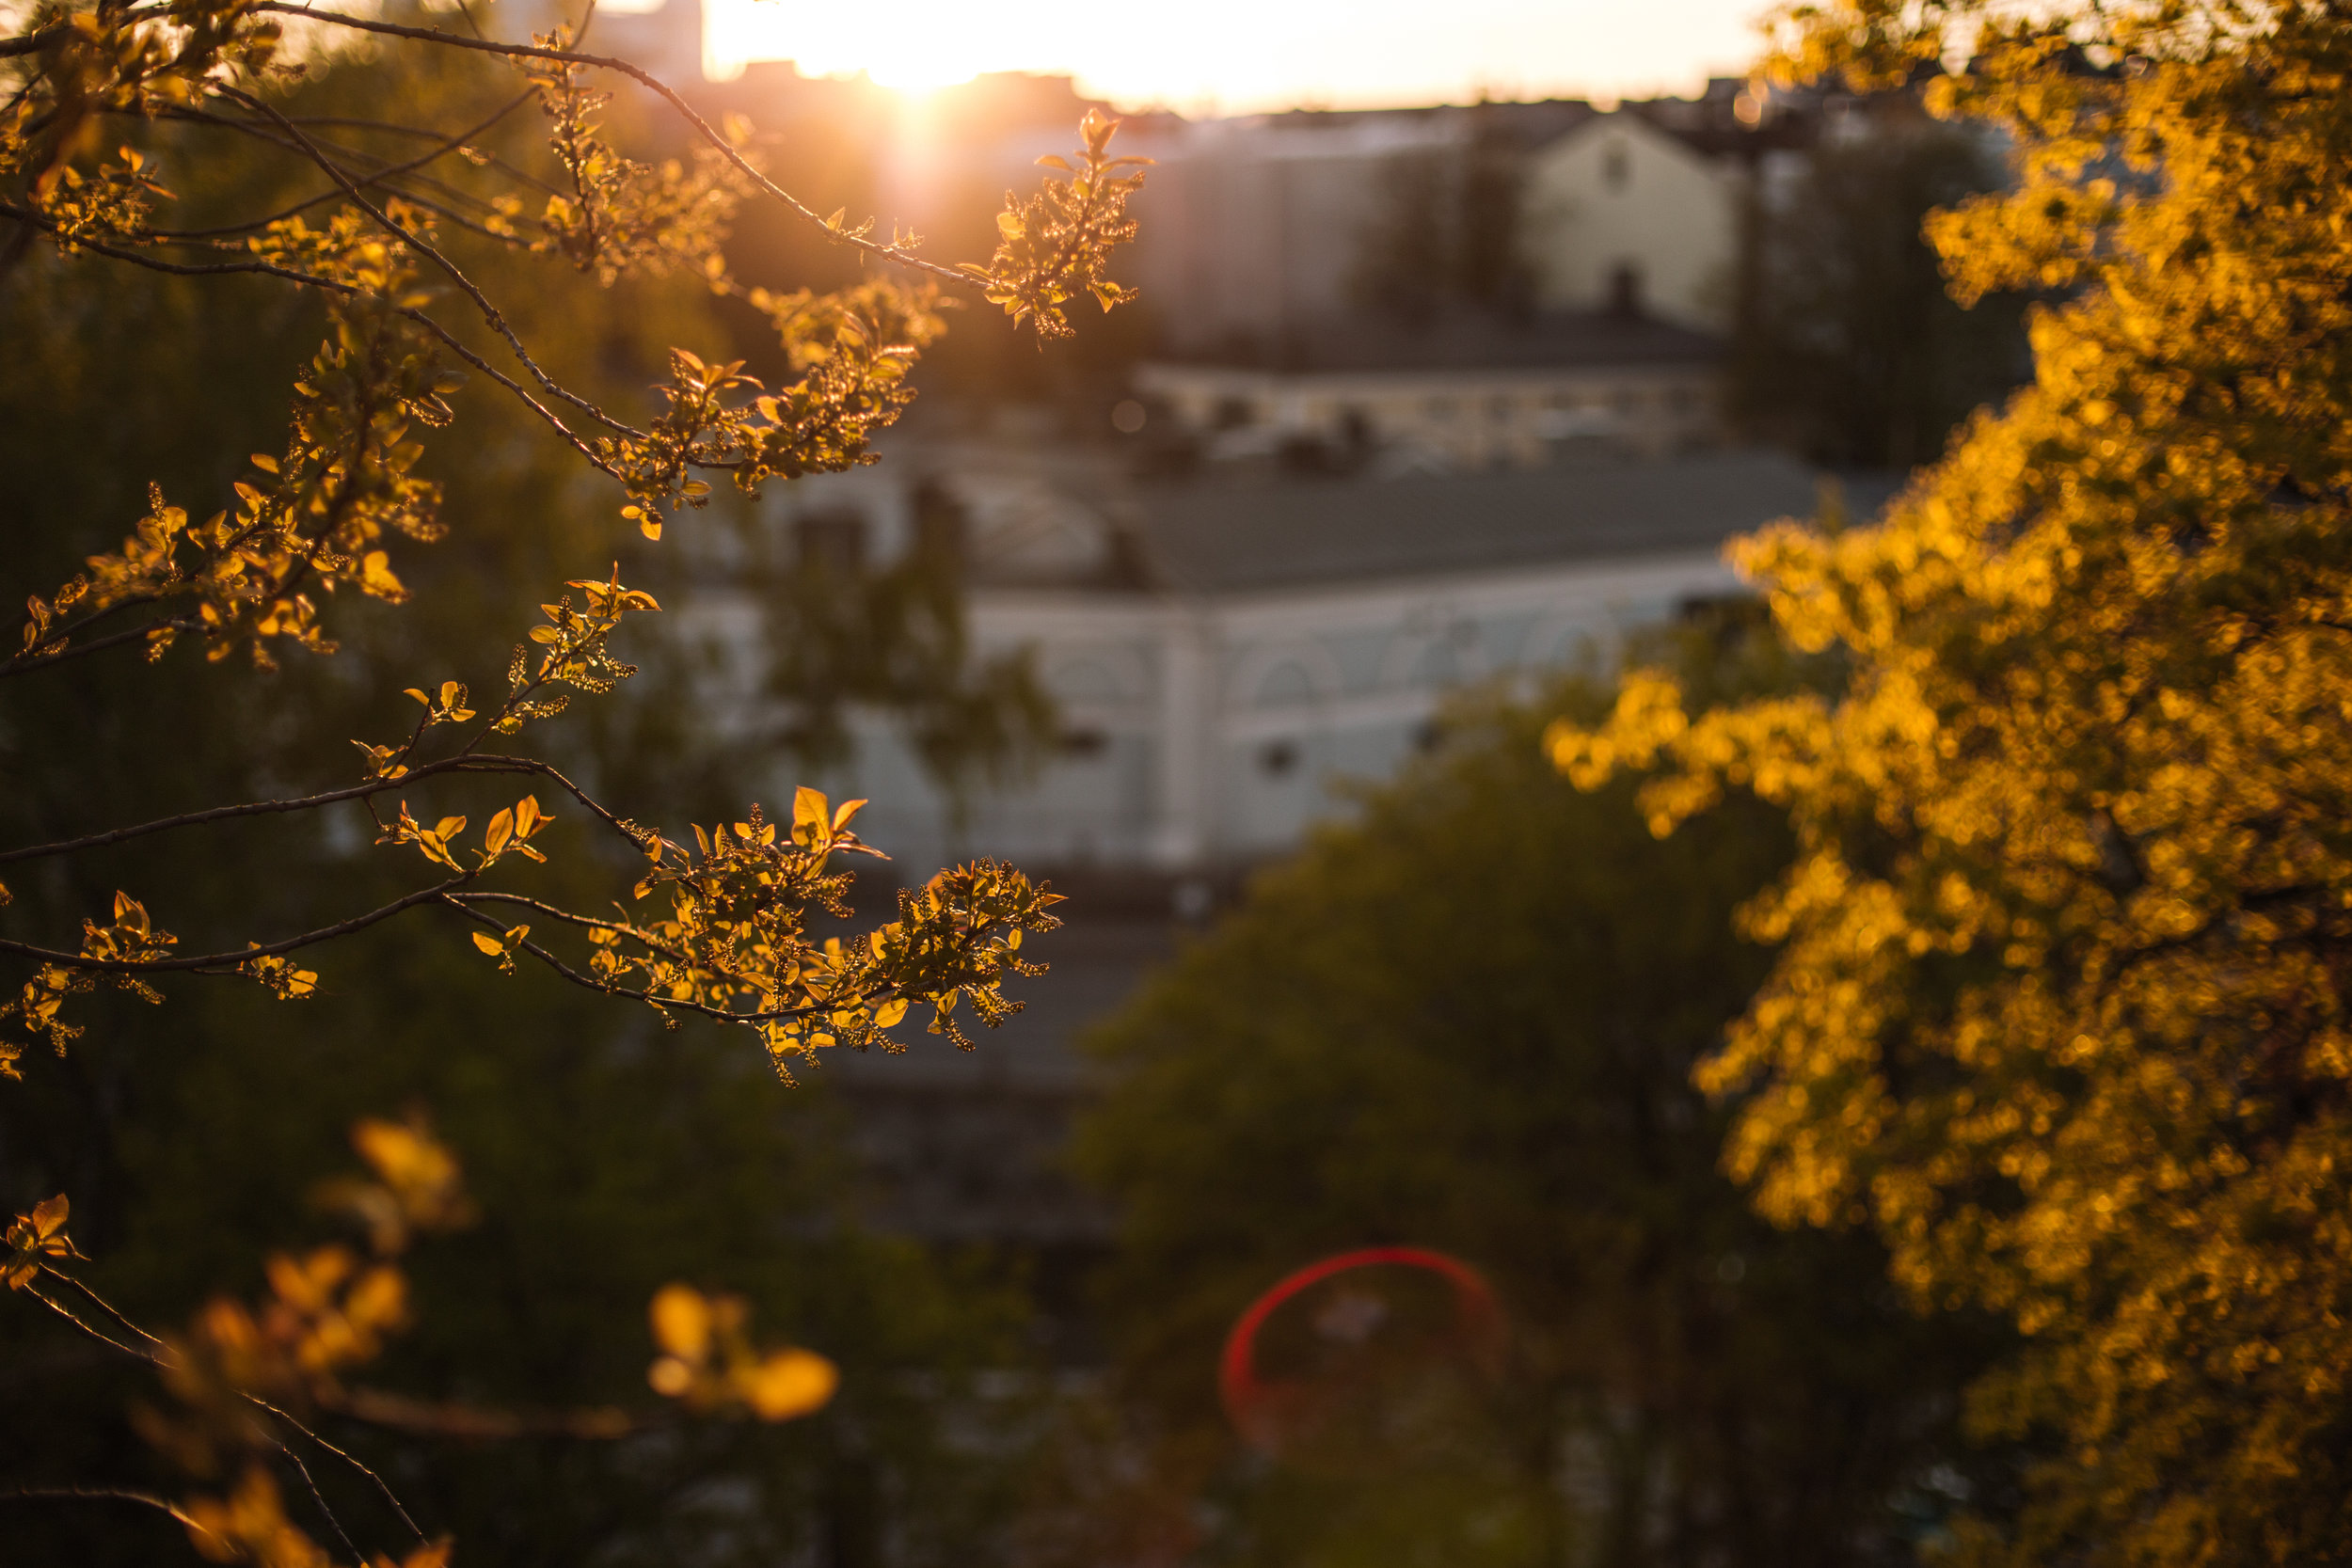 Finland_0519_0025.JPG